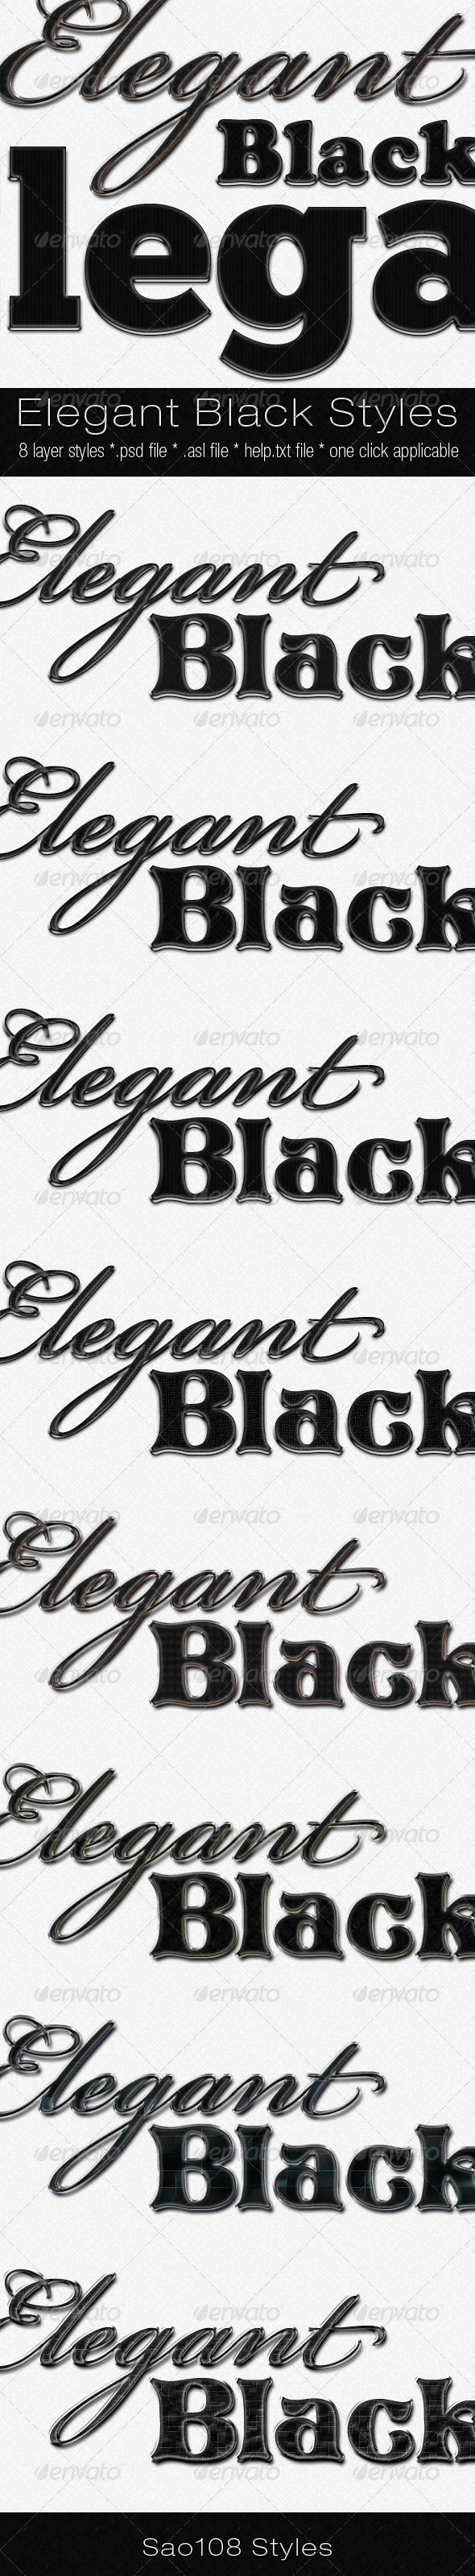 GraphicRiver Elegant black styles 3492018